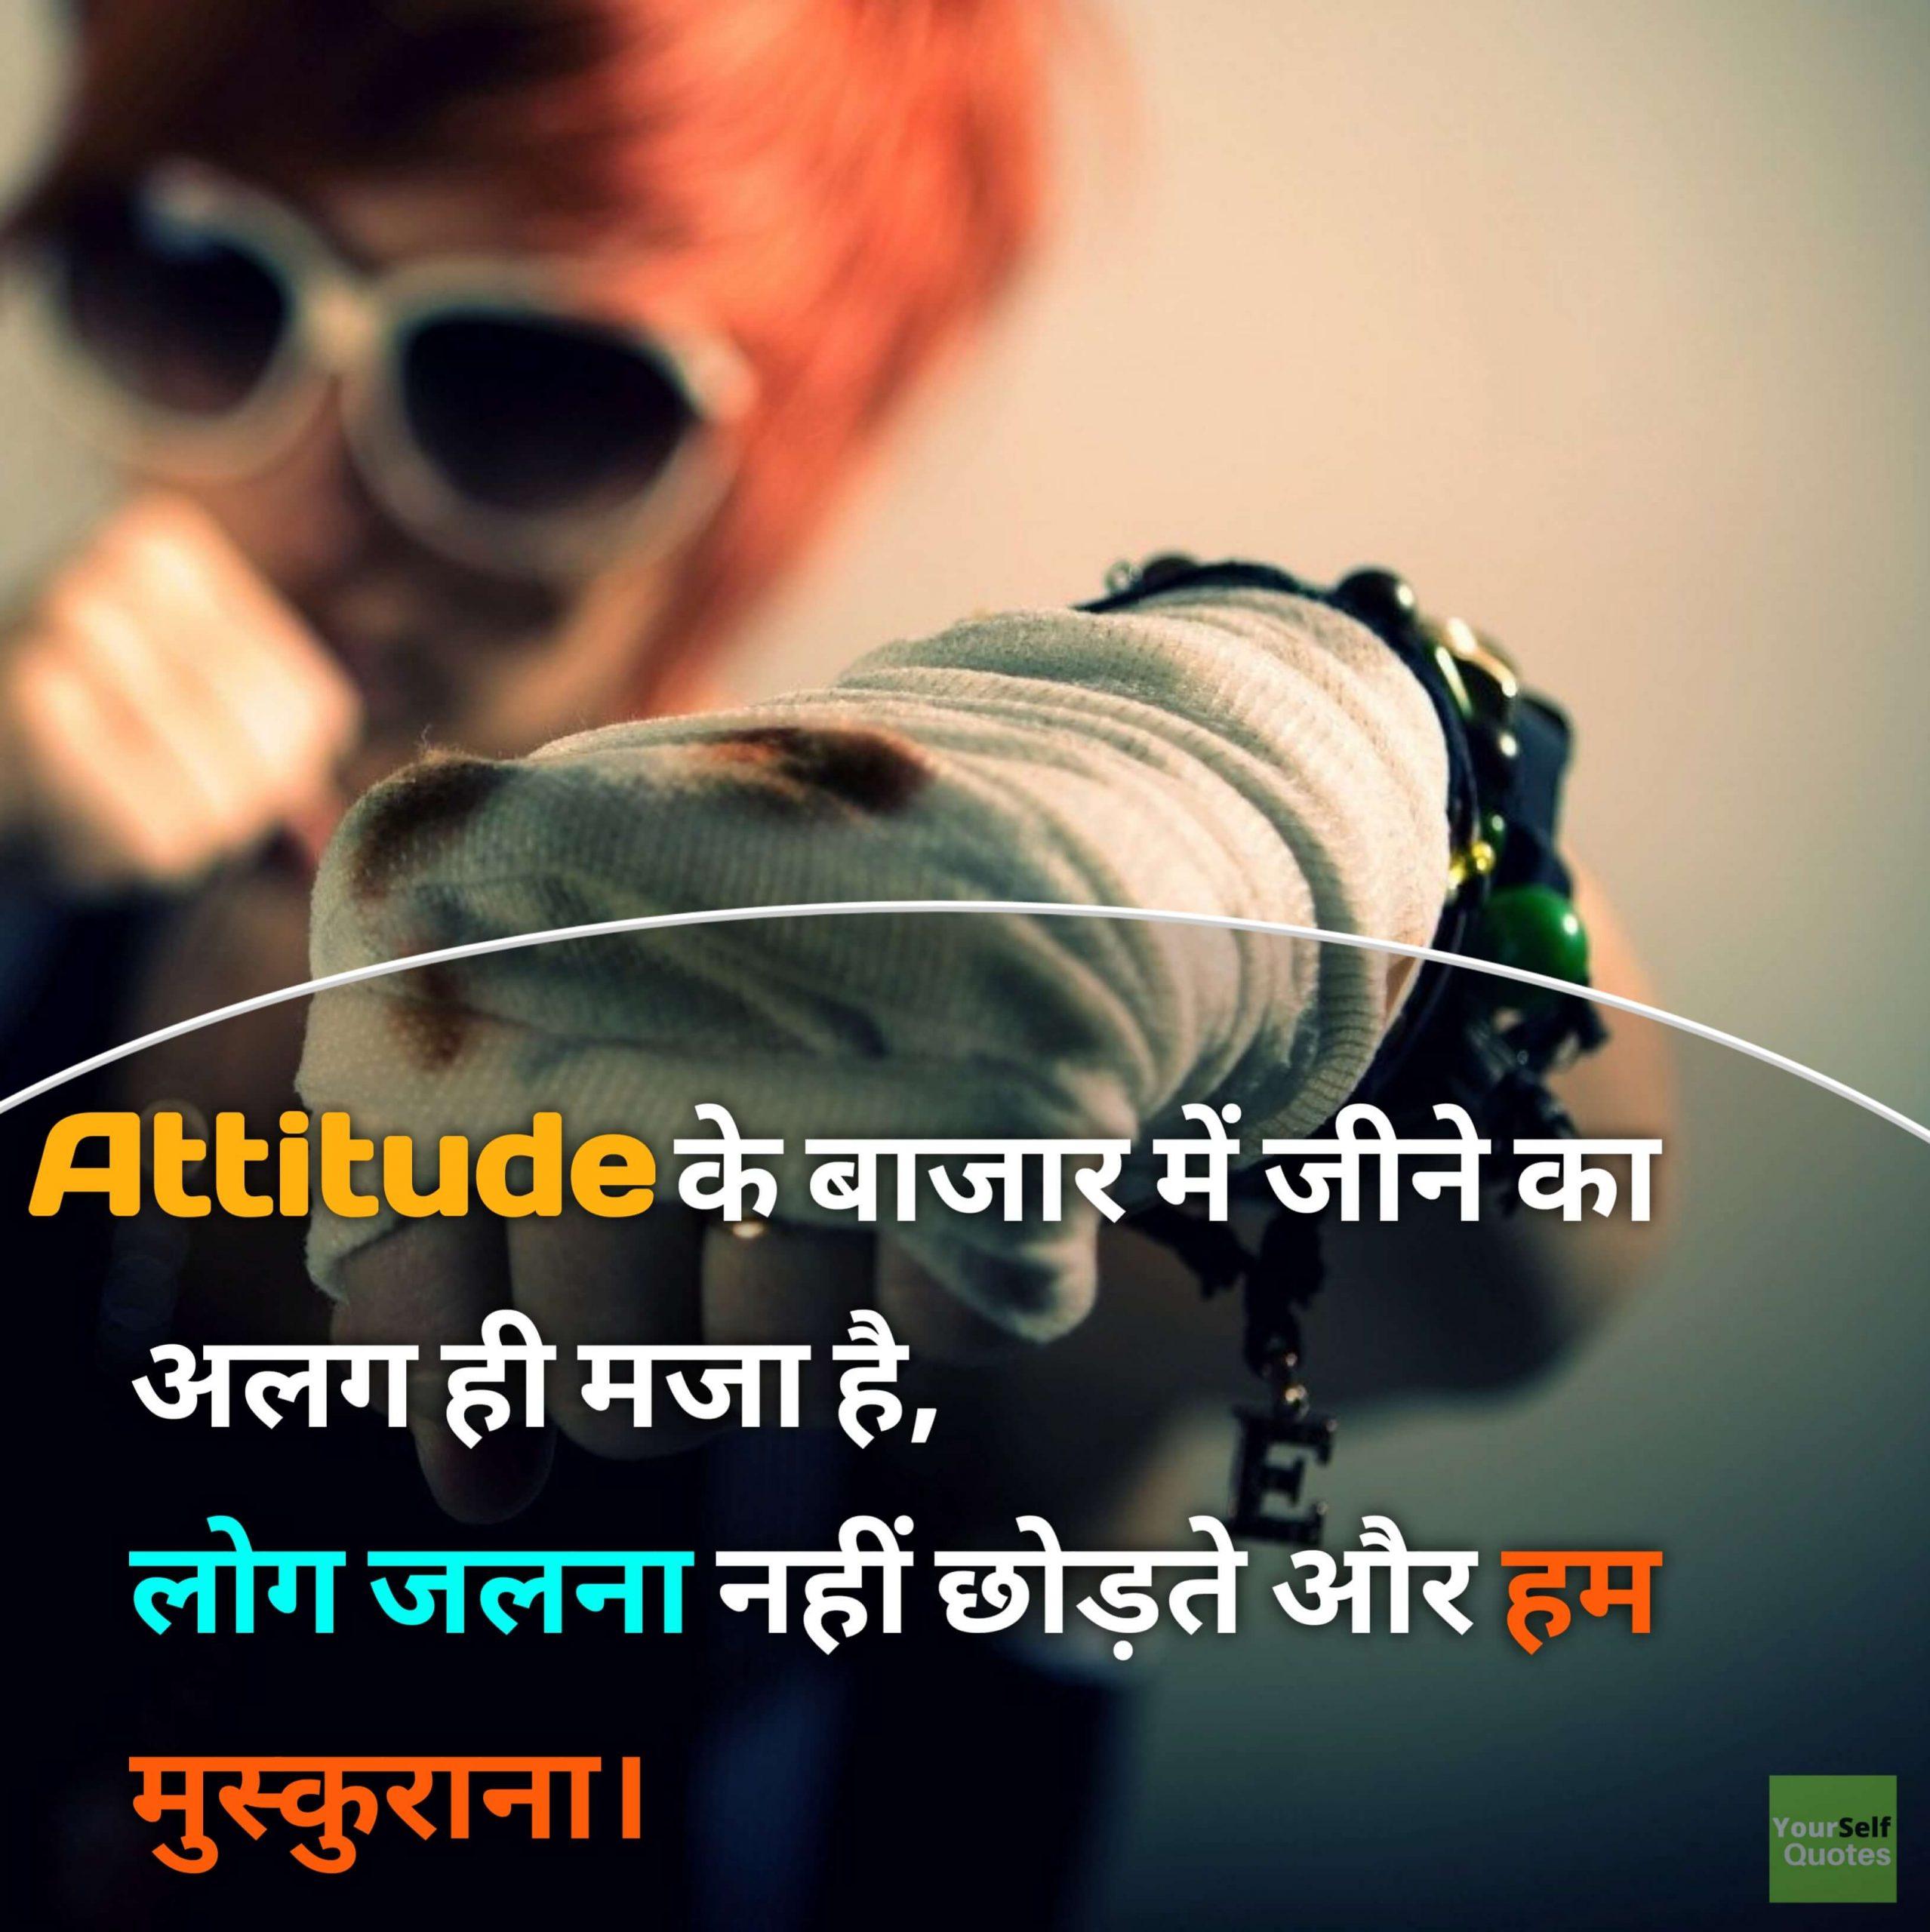 Attitude quotes for Boys | Best Attitude Quotes for Men